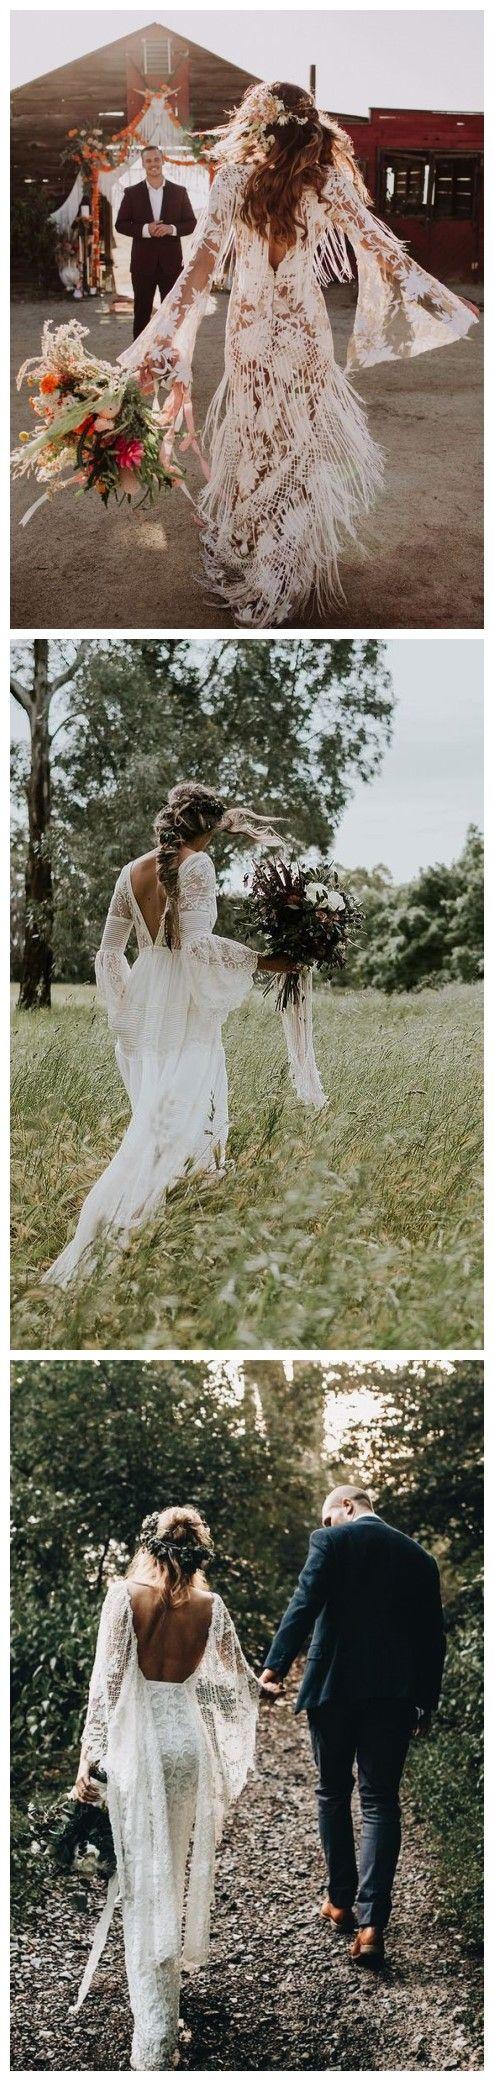 21 Oh So Amazing Bell Sleeve Wedding Dresses #weddings